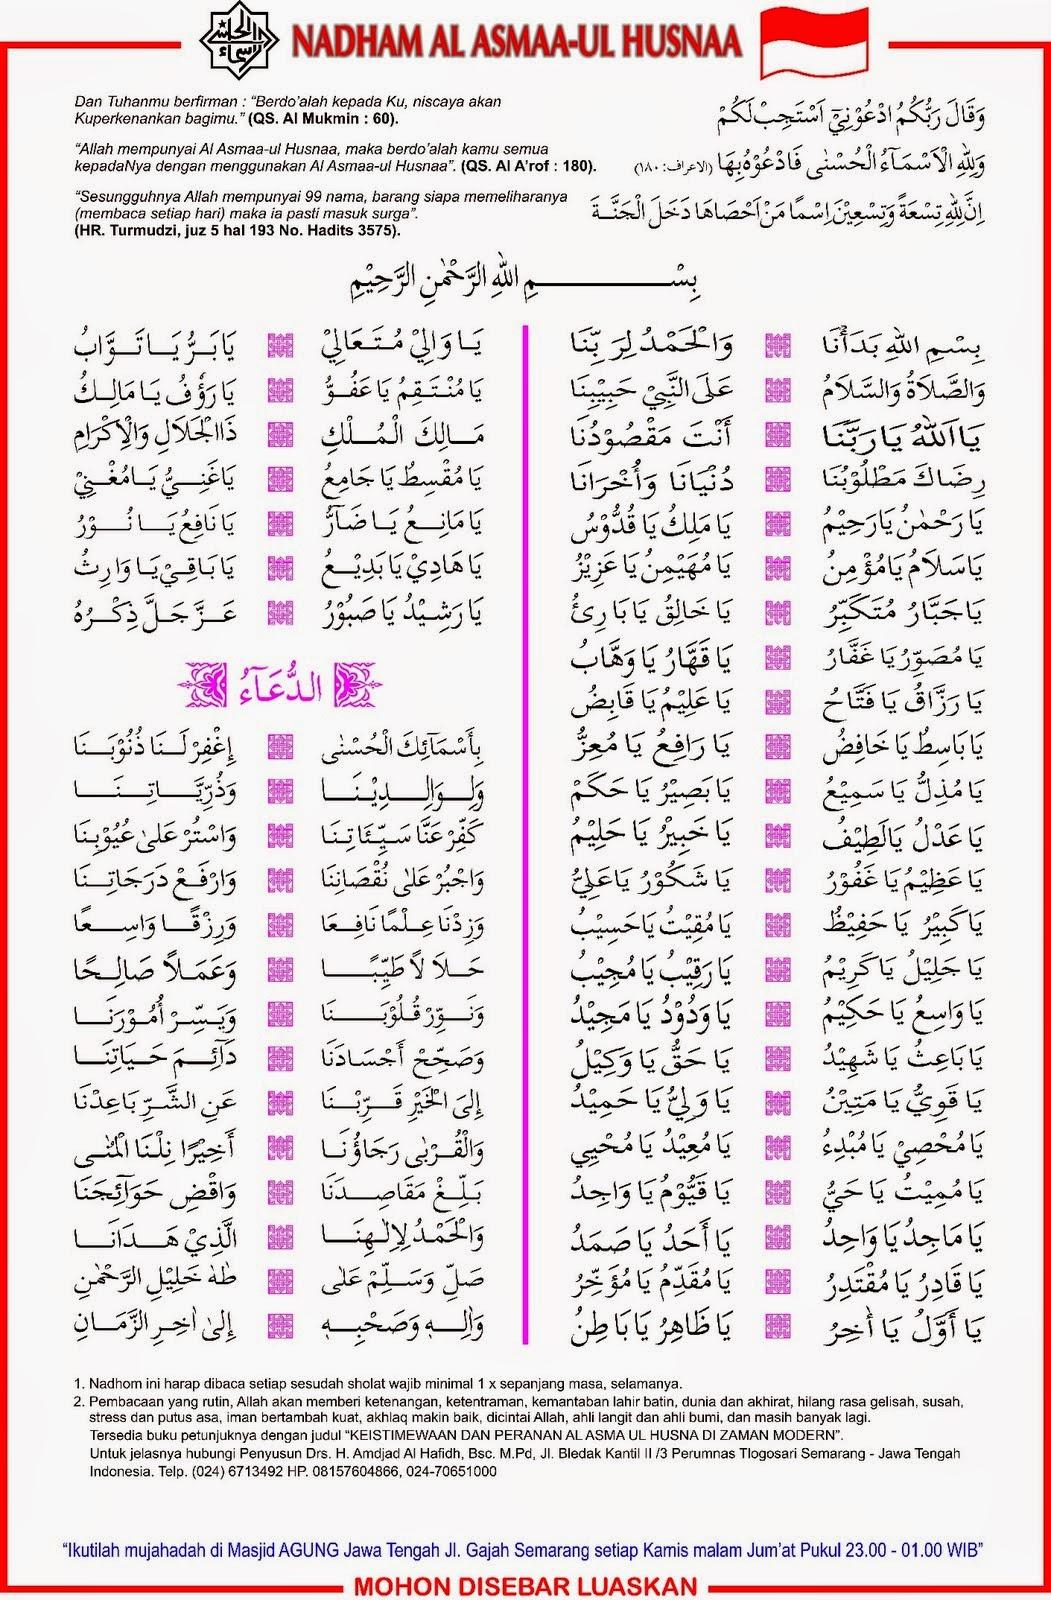 Asma Al Husna Related Keywords & Suggestions - Asma Al Husna Long Tail ...